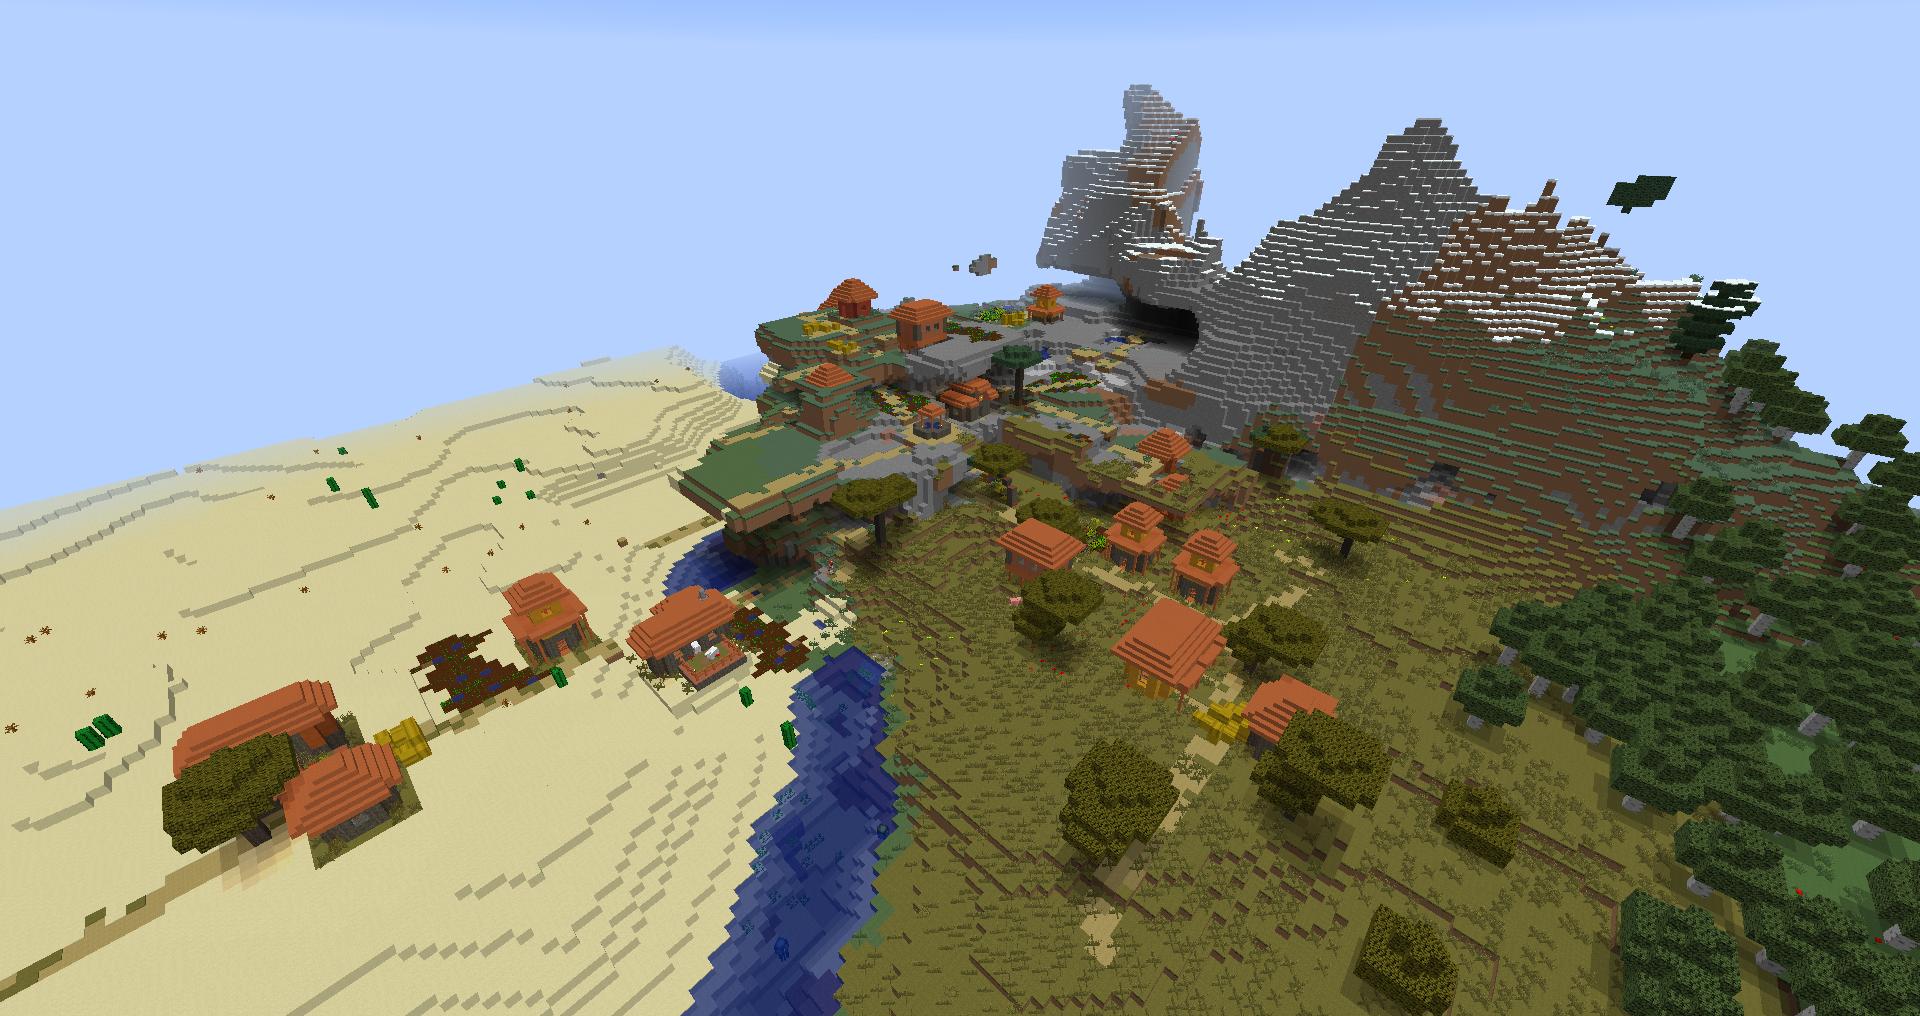 Modding Minecraft with Datapacks | The Hypertext Zone